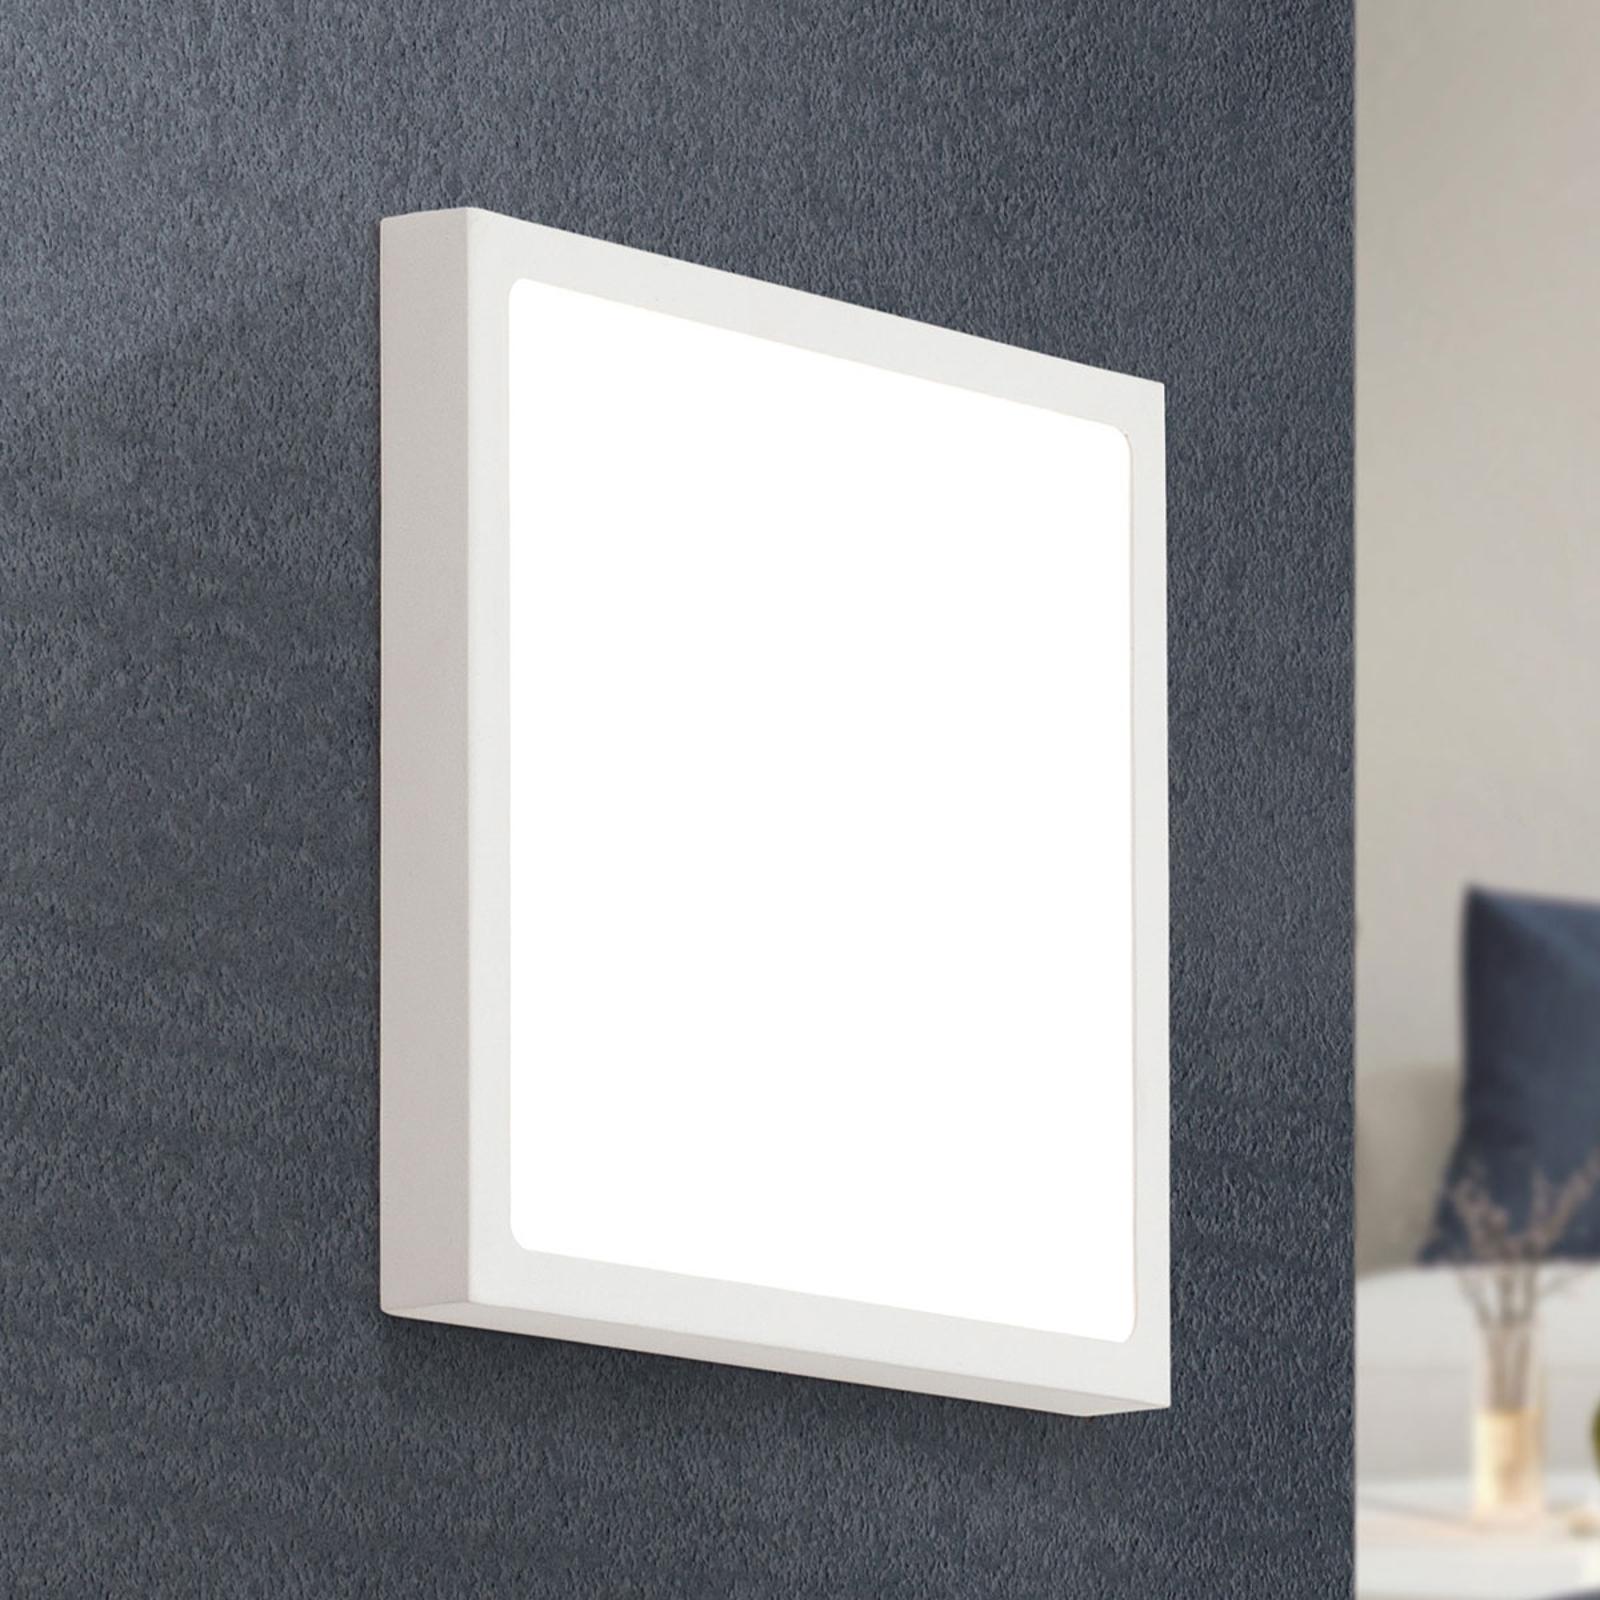 LED wandlamp Vika in vierkante vorm, 23 cm